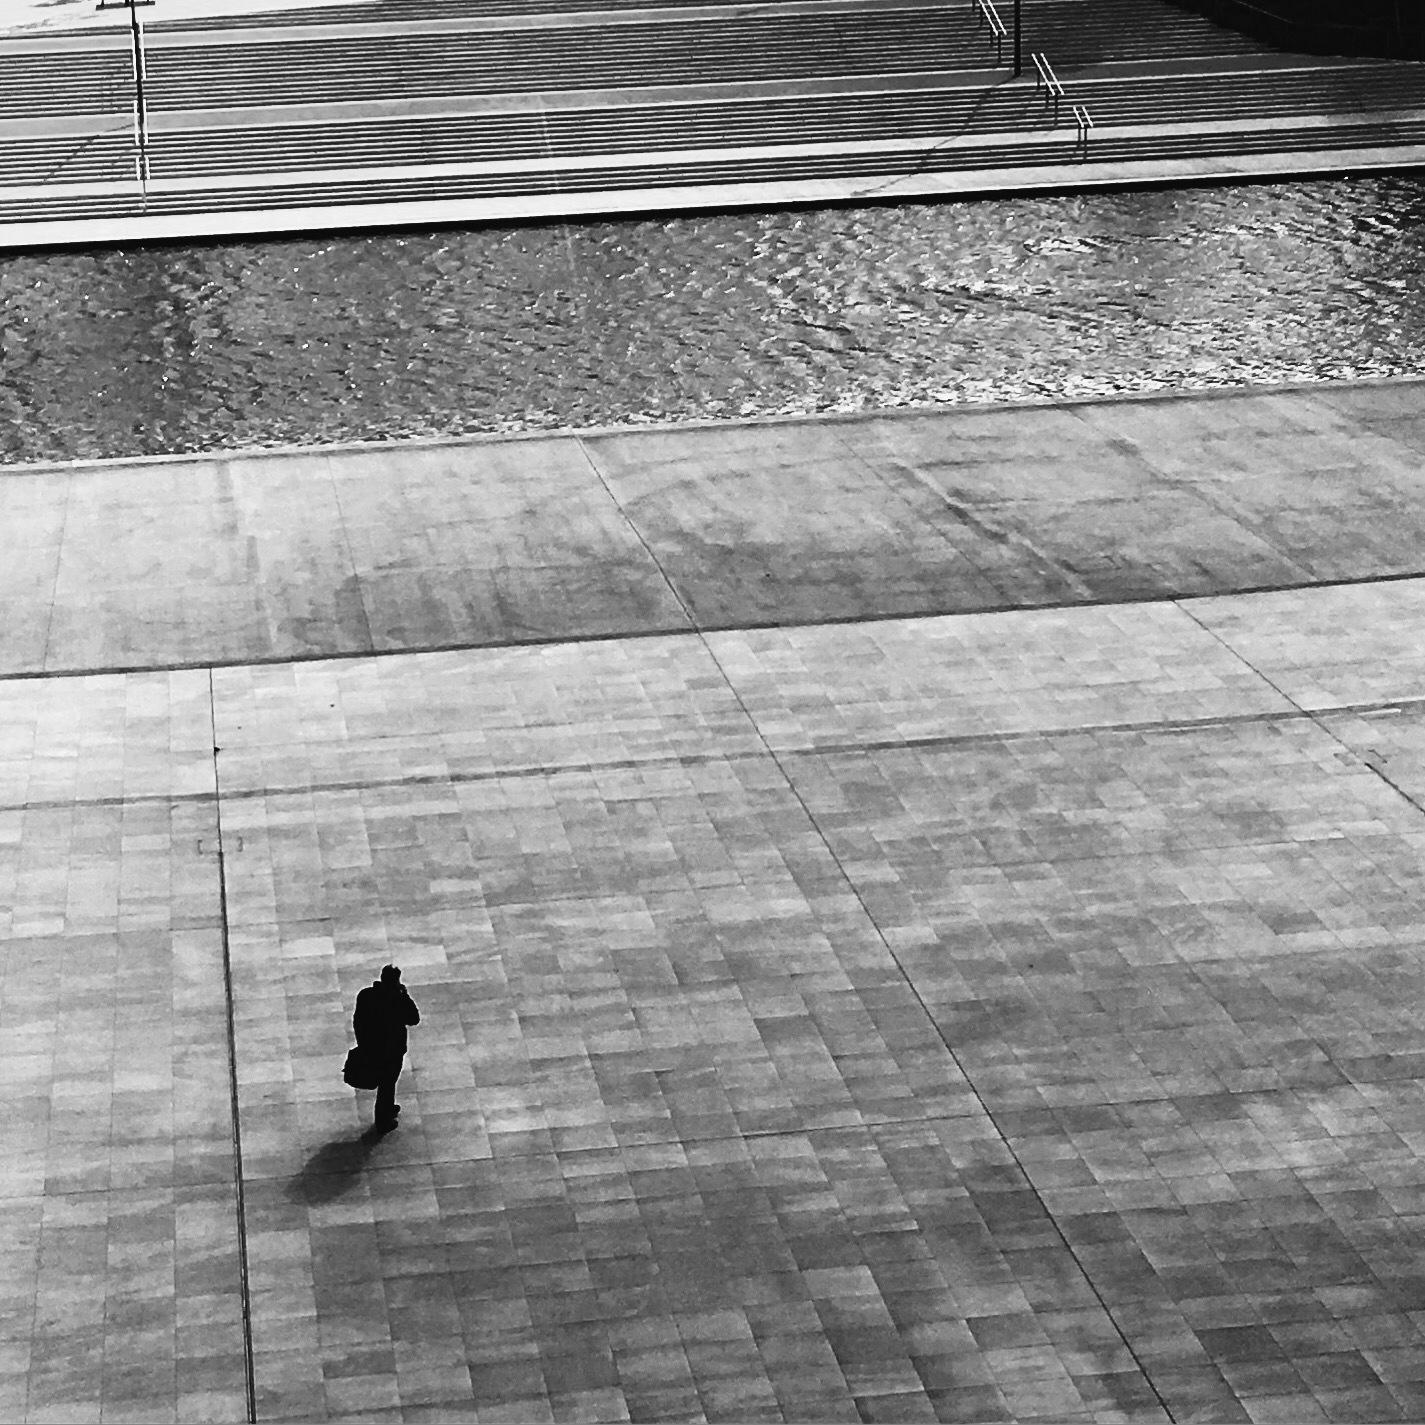 345 by George Best